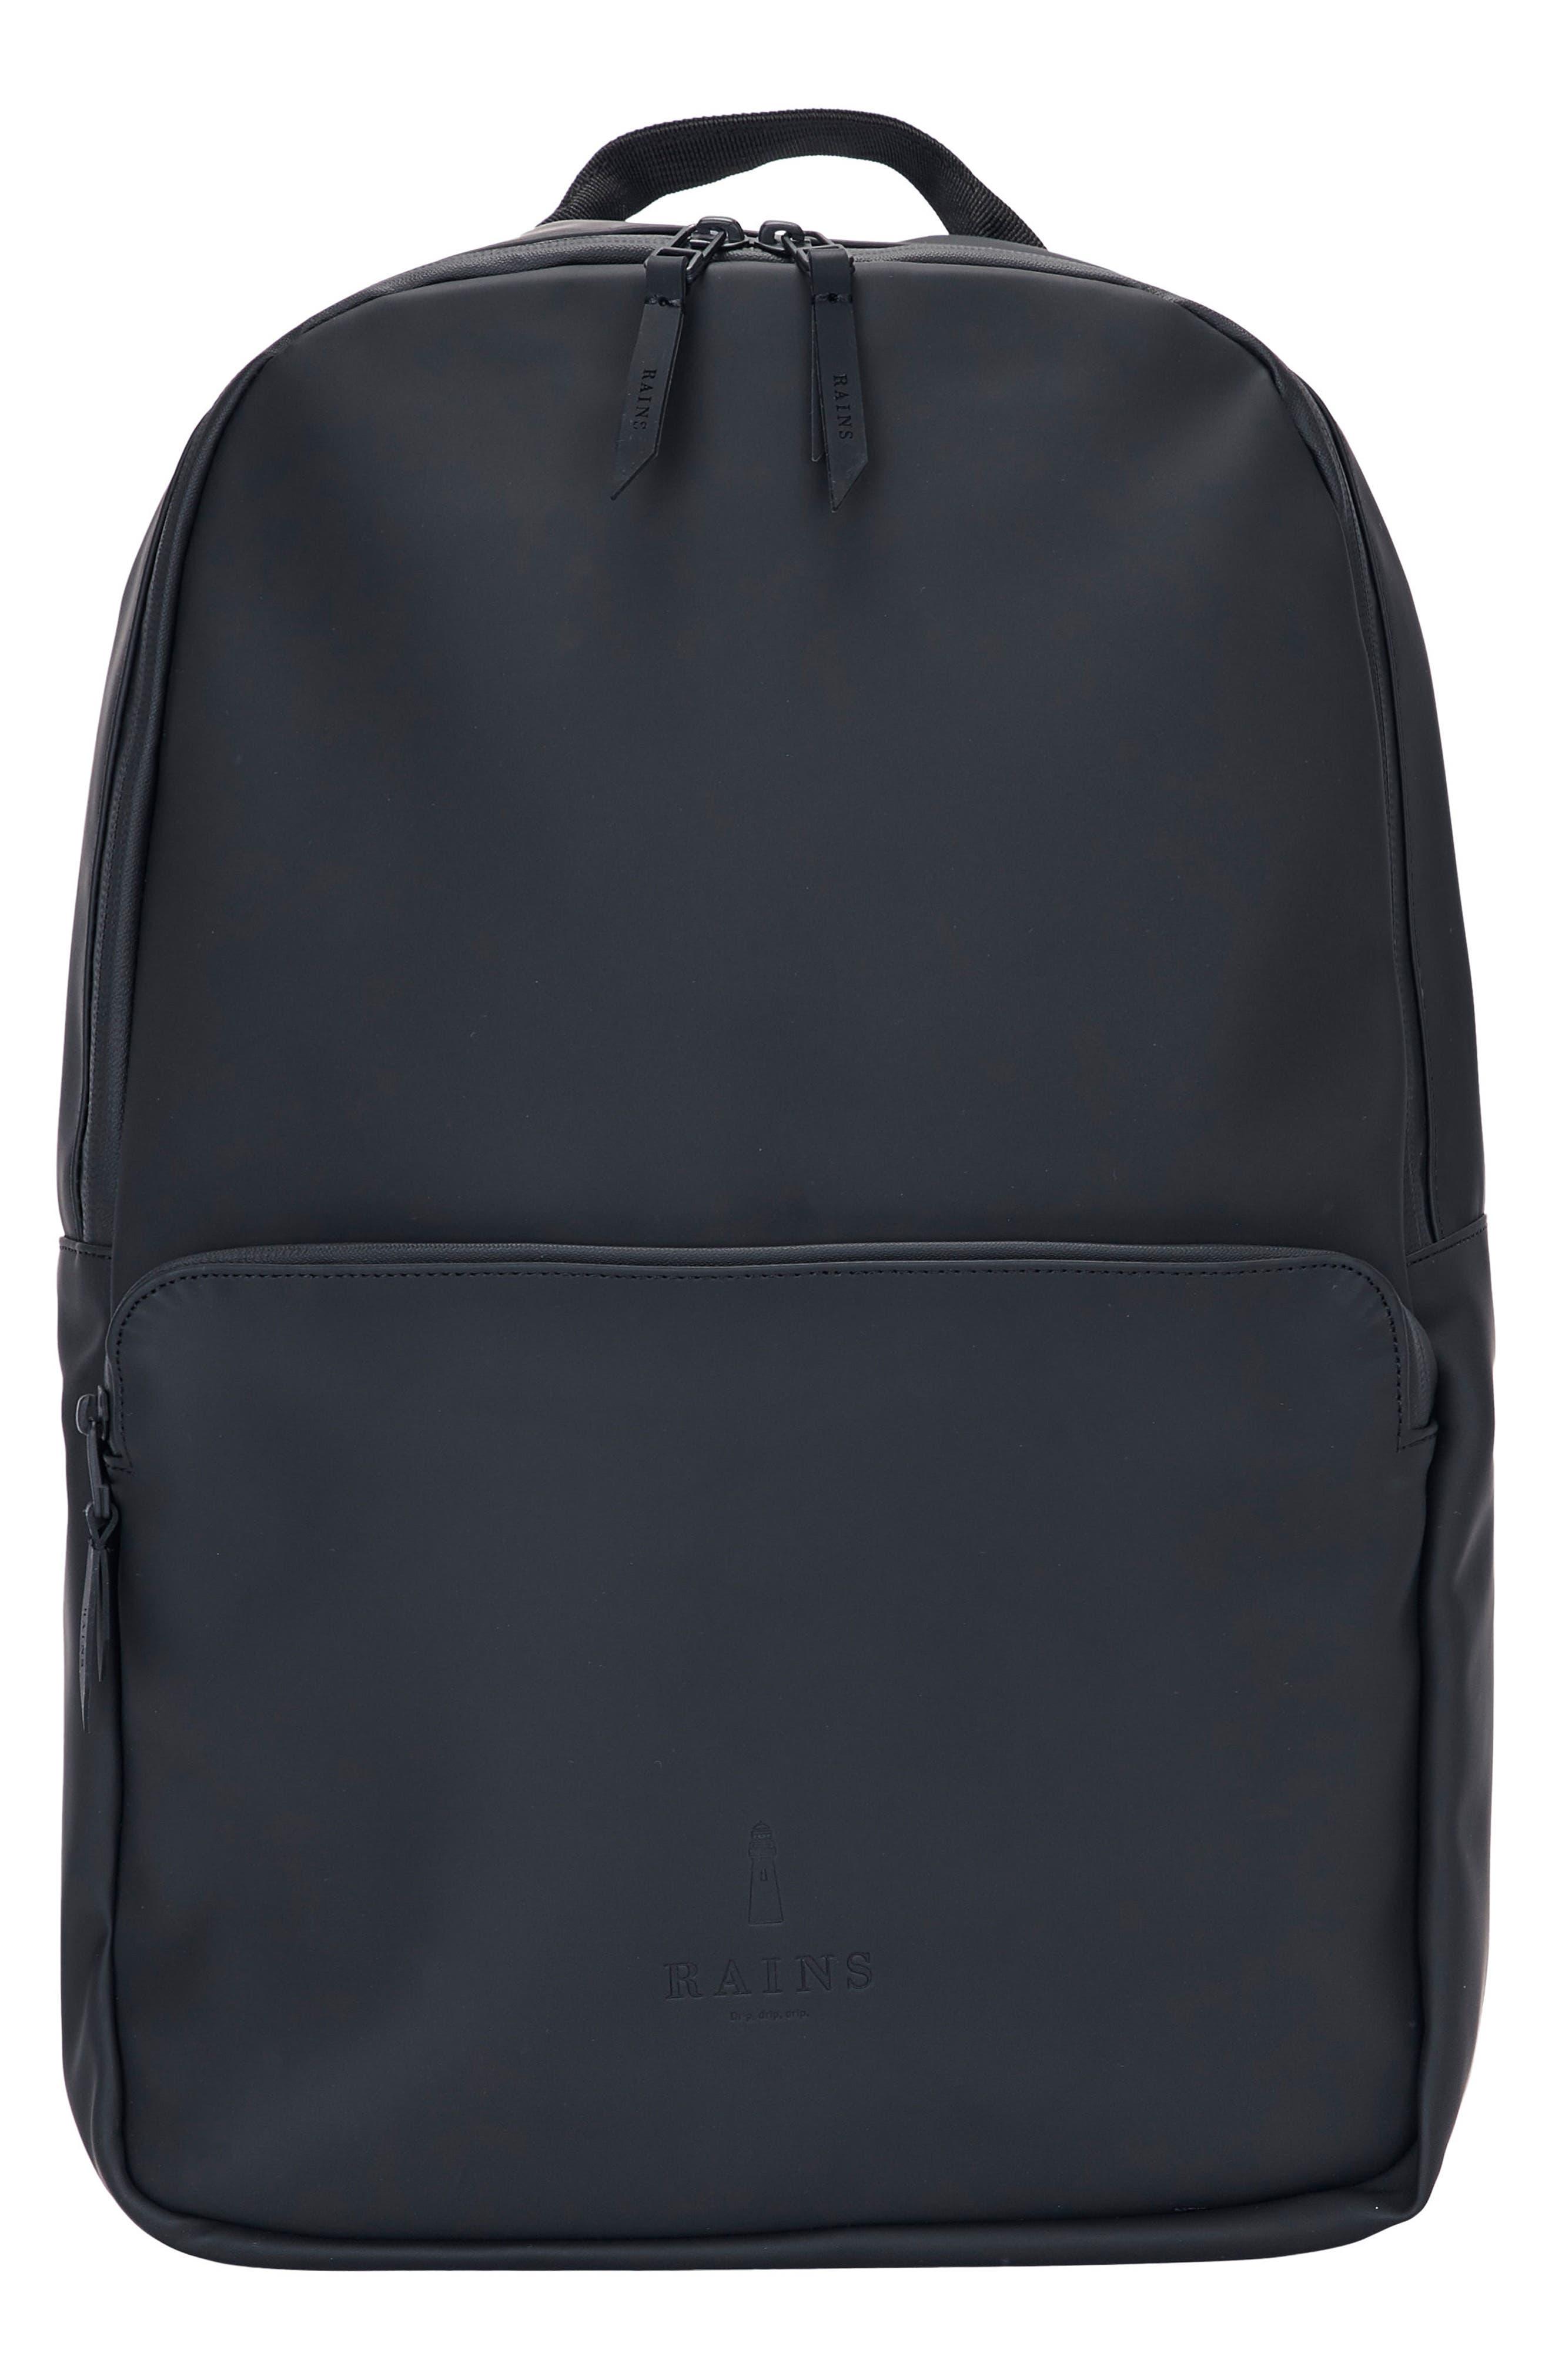 RAINS Field Backpack, Main, color, BLACK